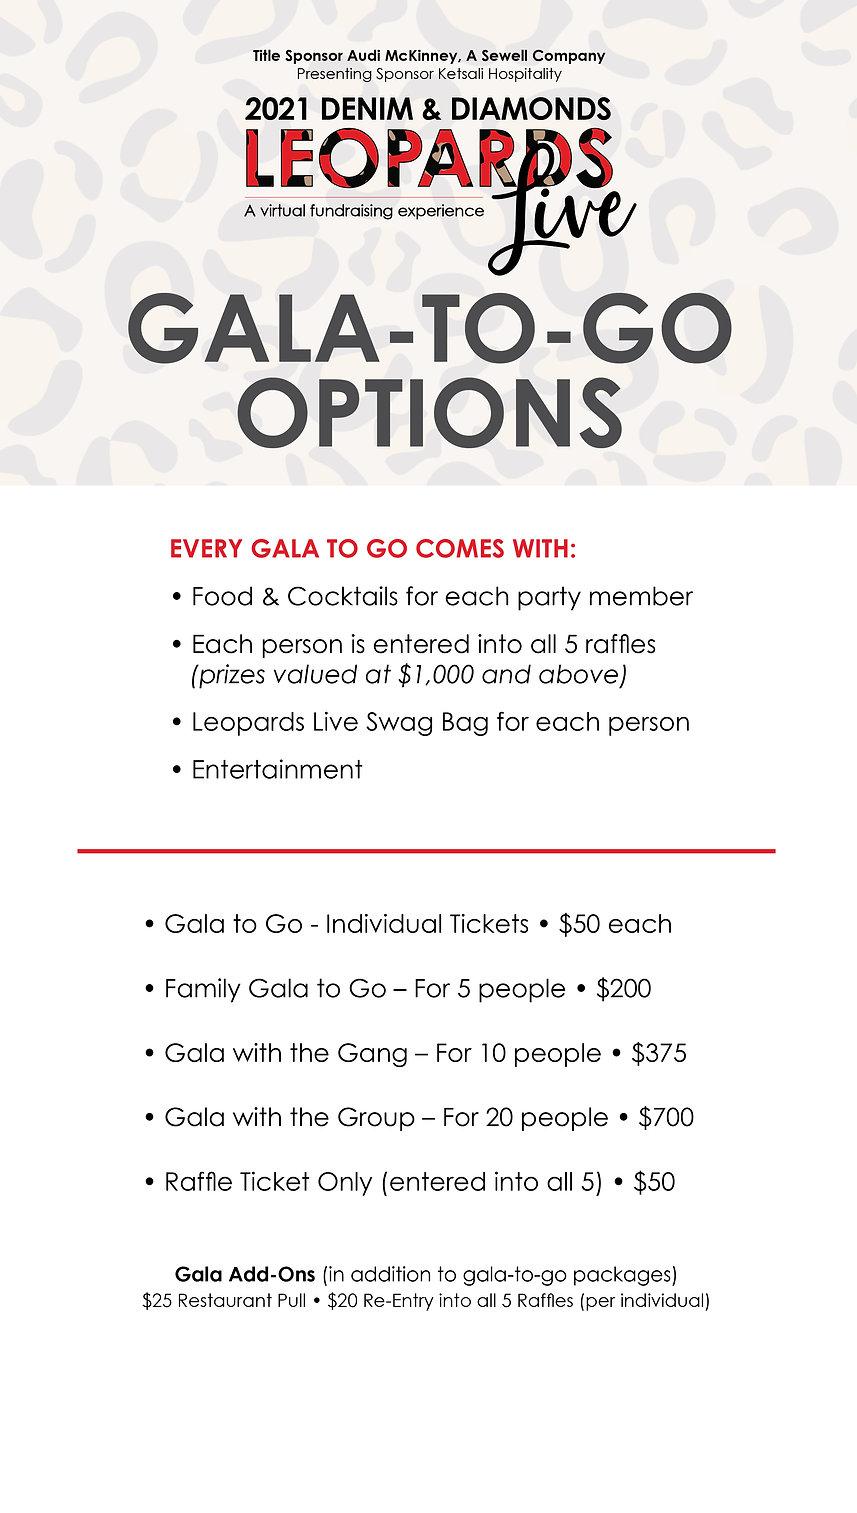 Gala to go options.jpg